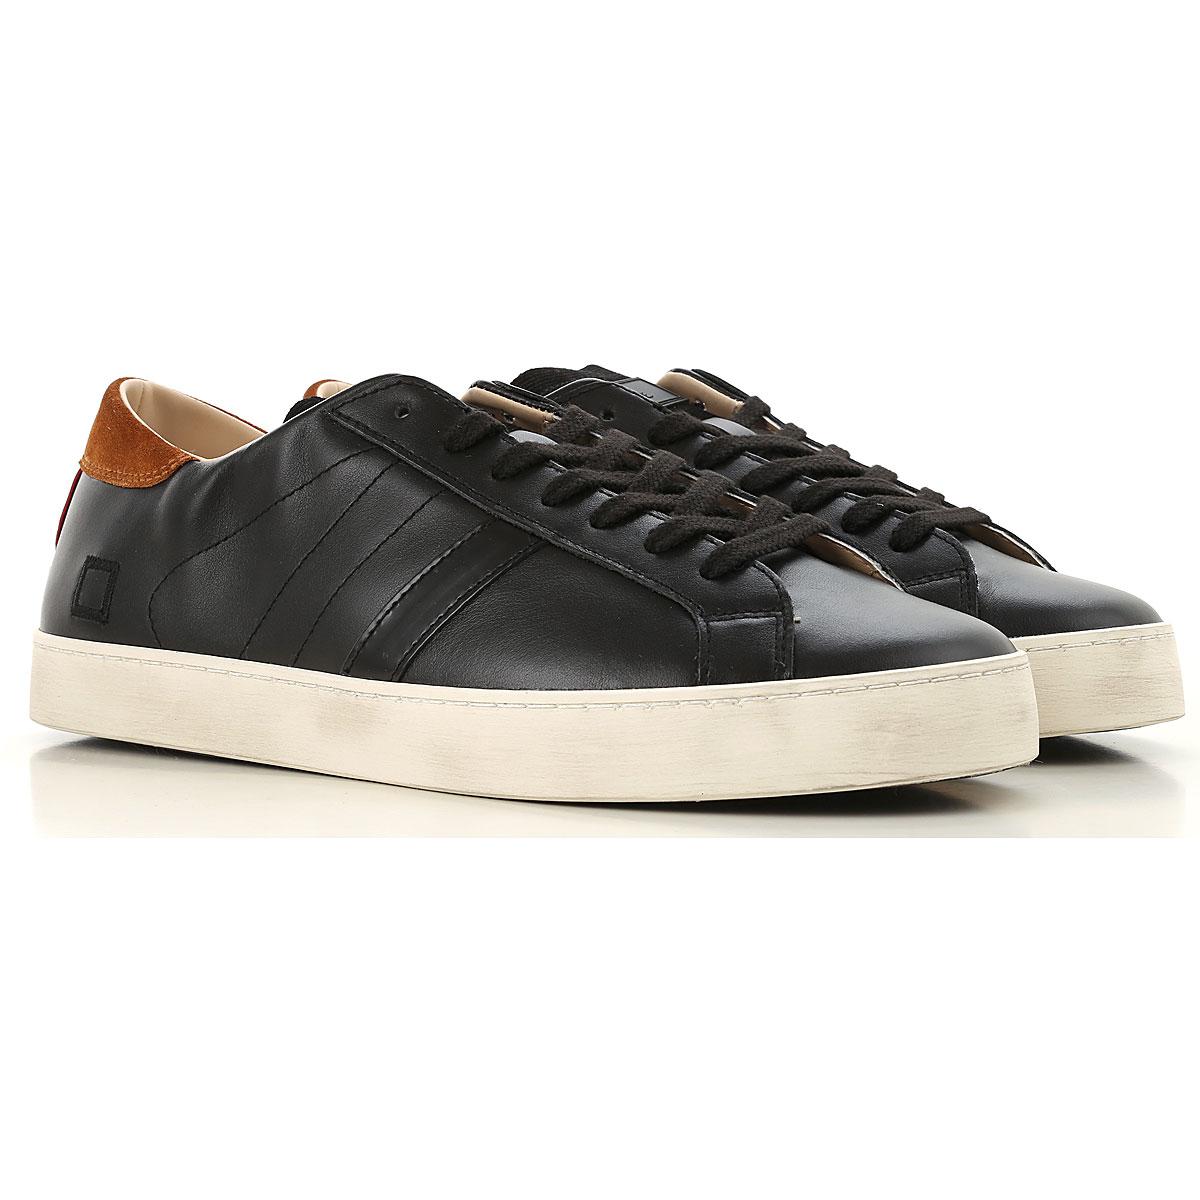 Image of D.A.T.E. Sneakers for Men, Black, Leather, 2017, US 7 - EU 40 - UK 6 - JP 26 US 8 - EU 41 - UK 7 - JP 26.5 US 9 - EU 42 - UK 8 - JP 27 US 10 - EU 43 - UK 9 - JP 27.5 US 11 - EU 44 - UK 10 - JP 28